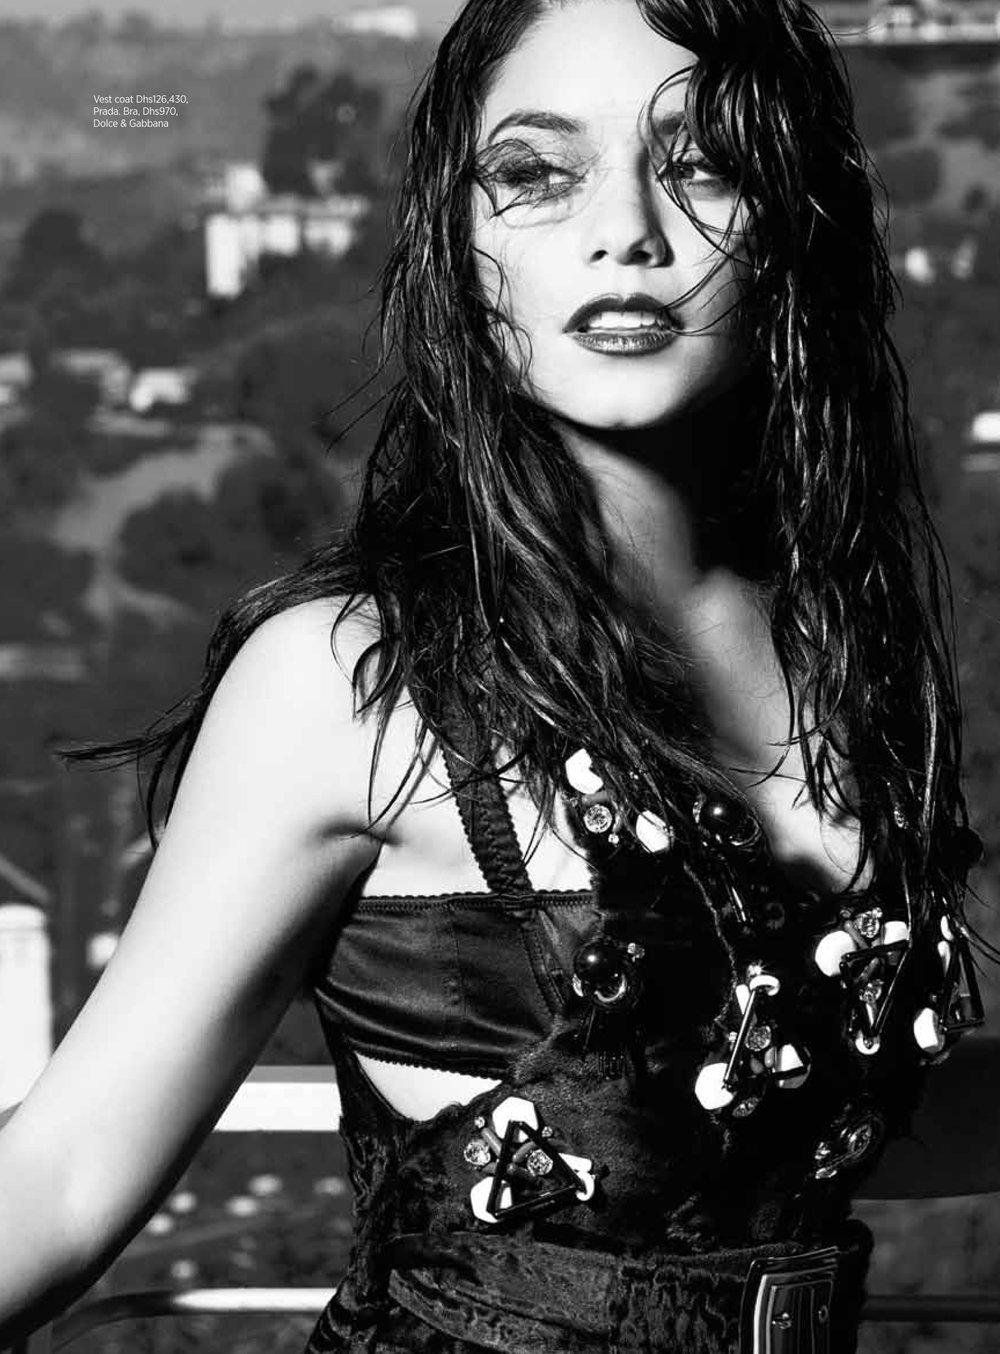 VanessaHudgens-HarpersArabia-Dec12-KM_2.jpg